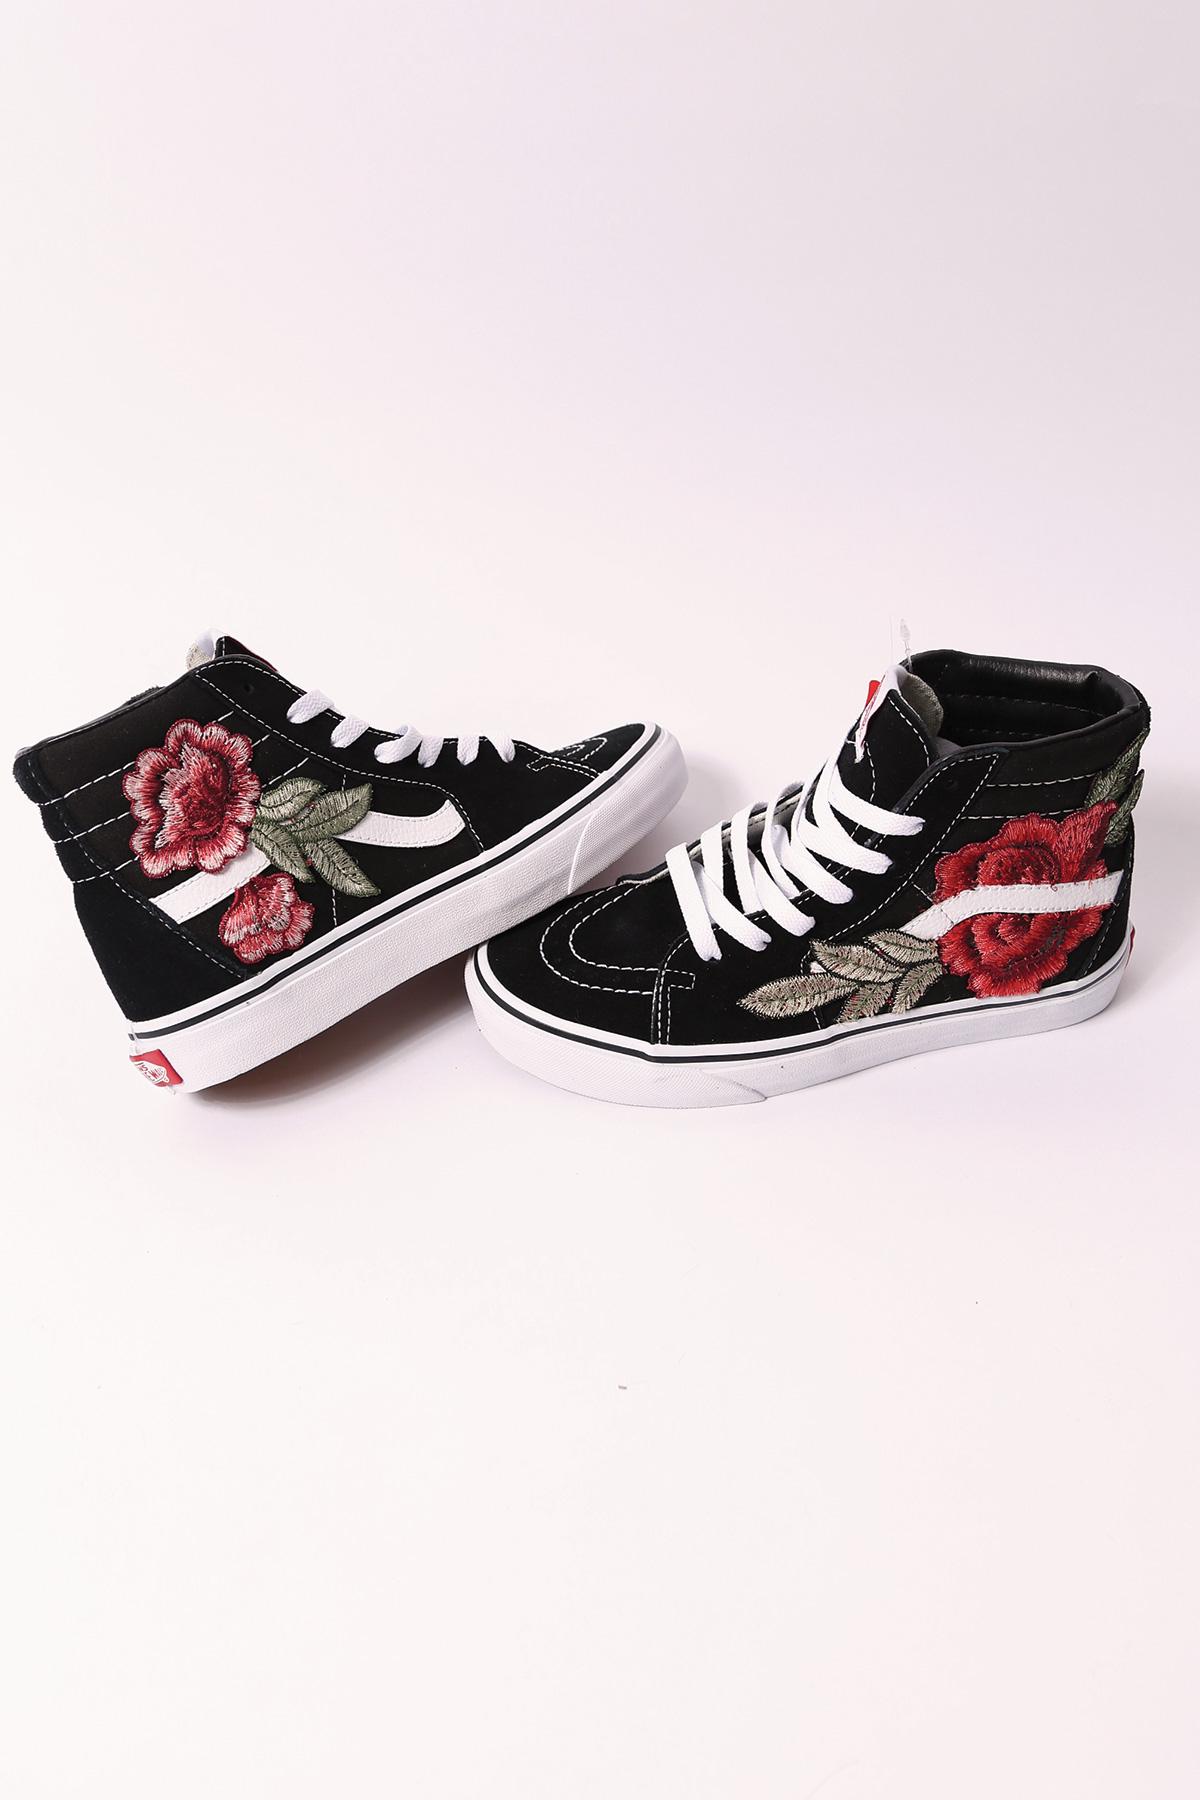 rose vans